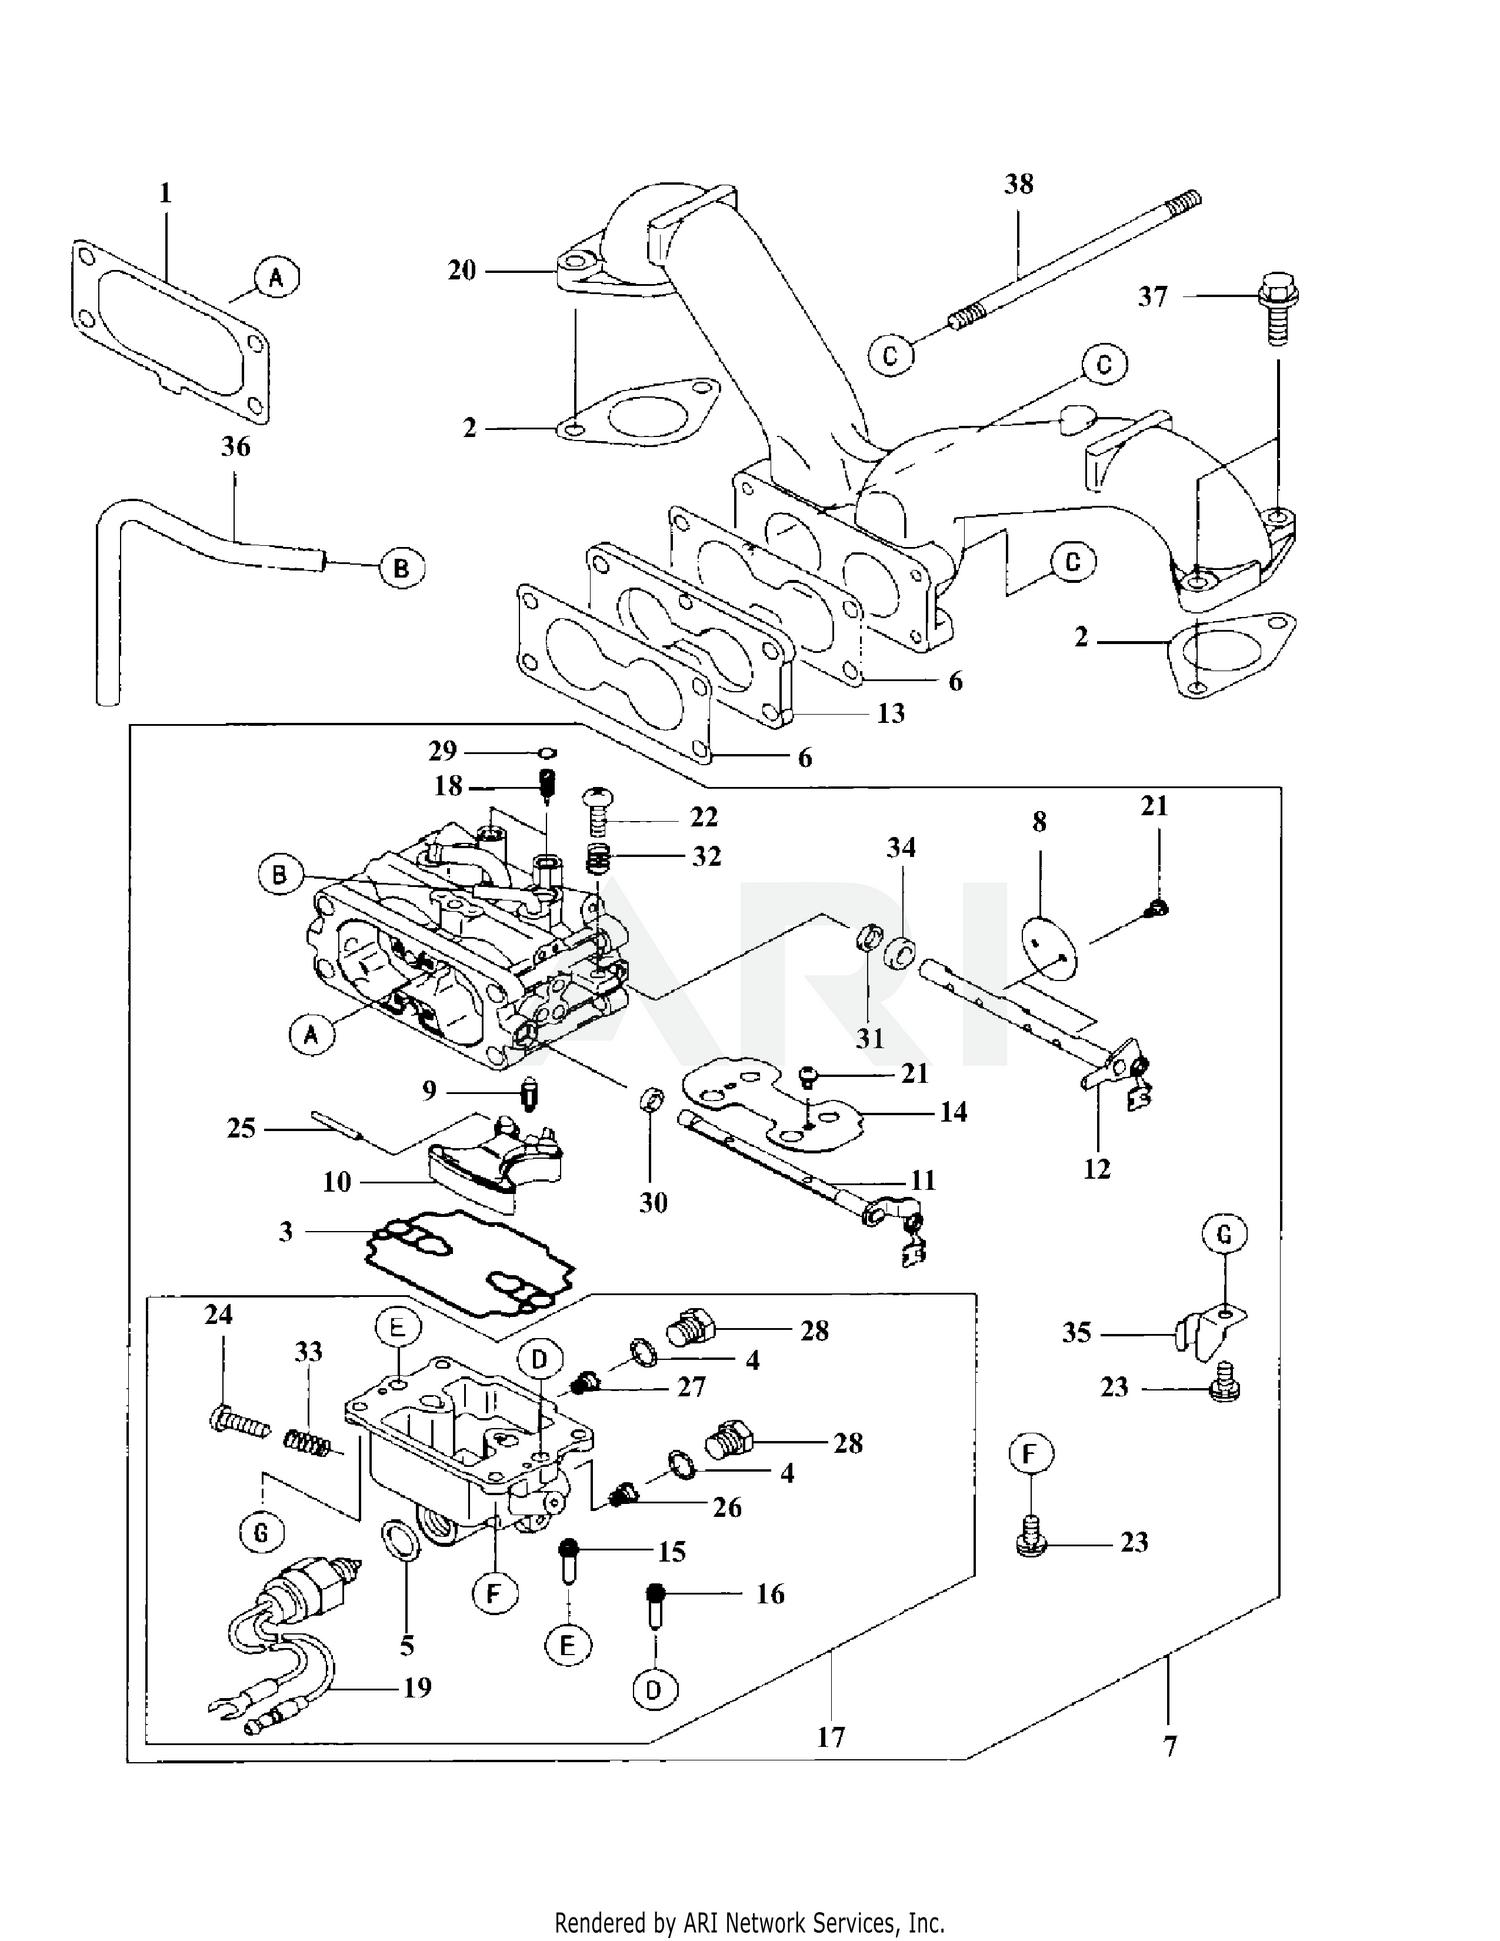 Cub Cadet Kawasaki Engine Diagram - seniorsclub.it wires-track -  wires-track.hazzart.itHazzart